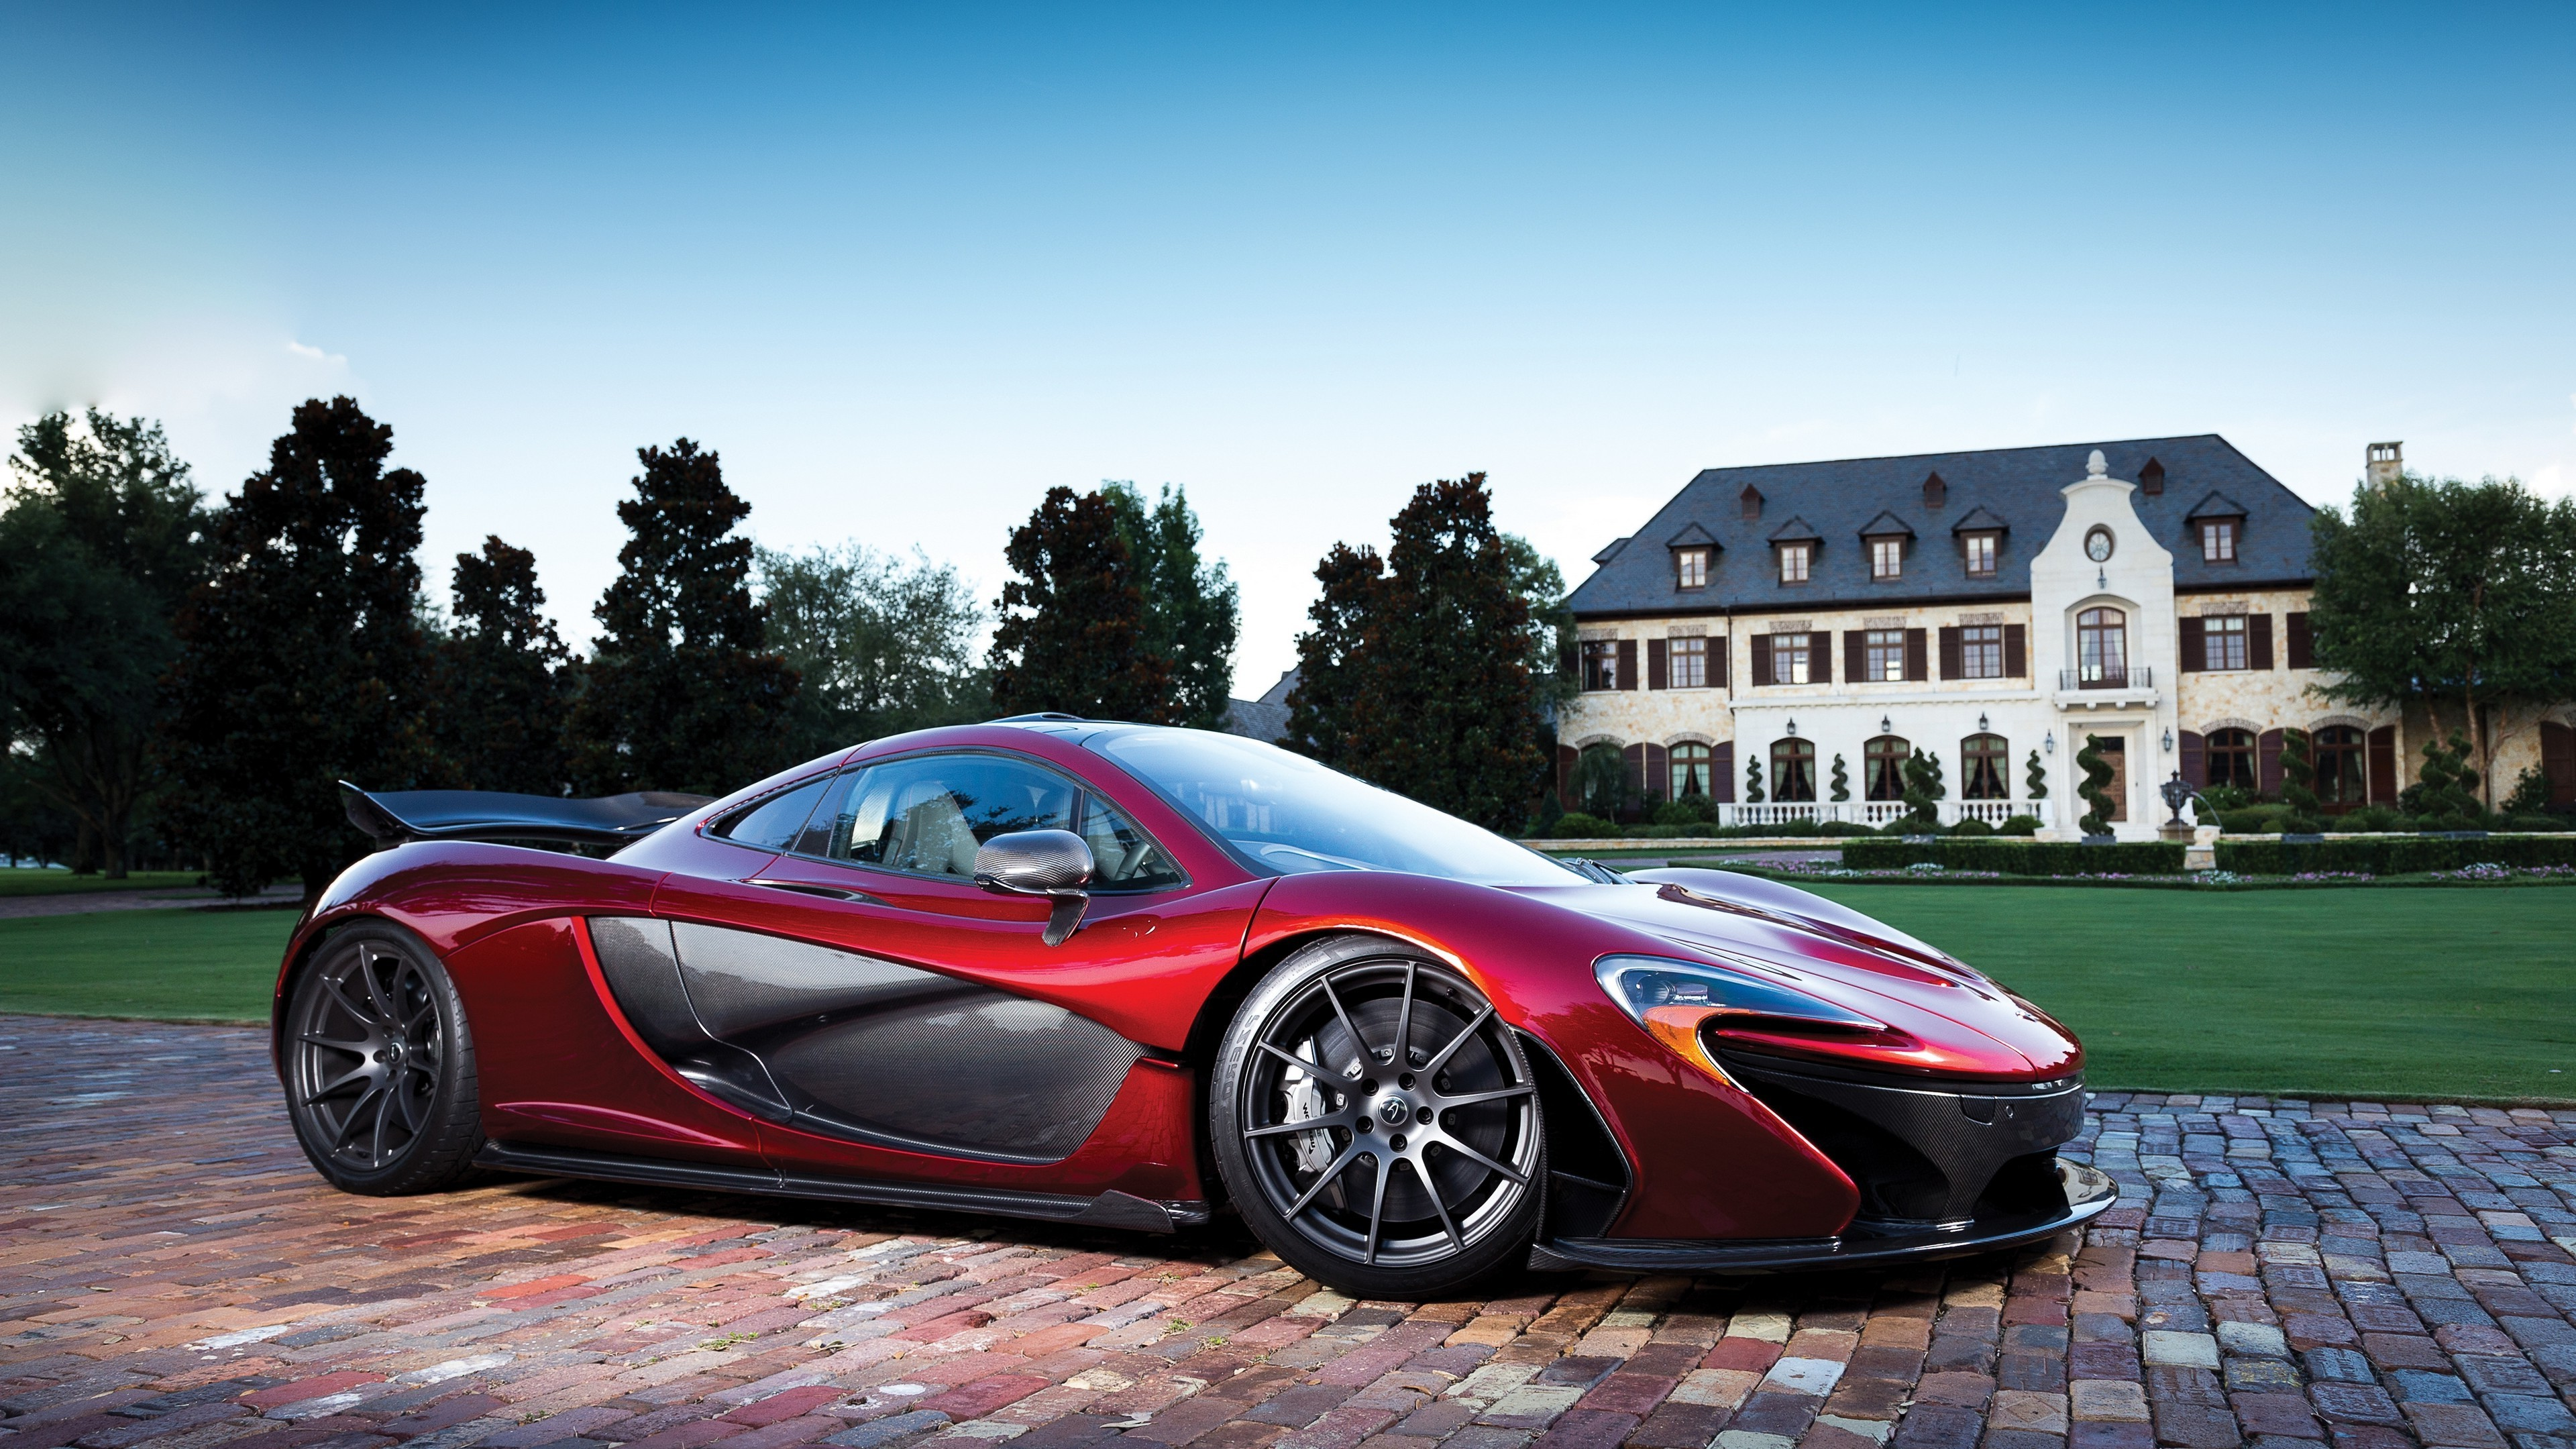 Mclaren P1 Car, HD Cars, 4k Wallpapers, Images ...